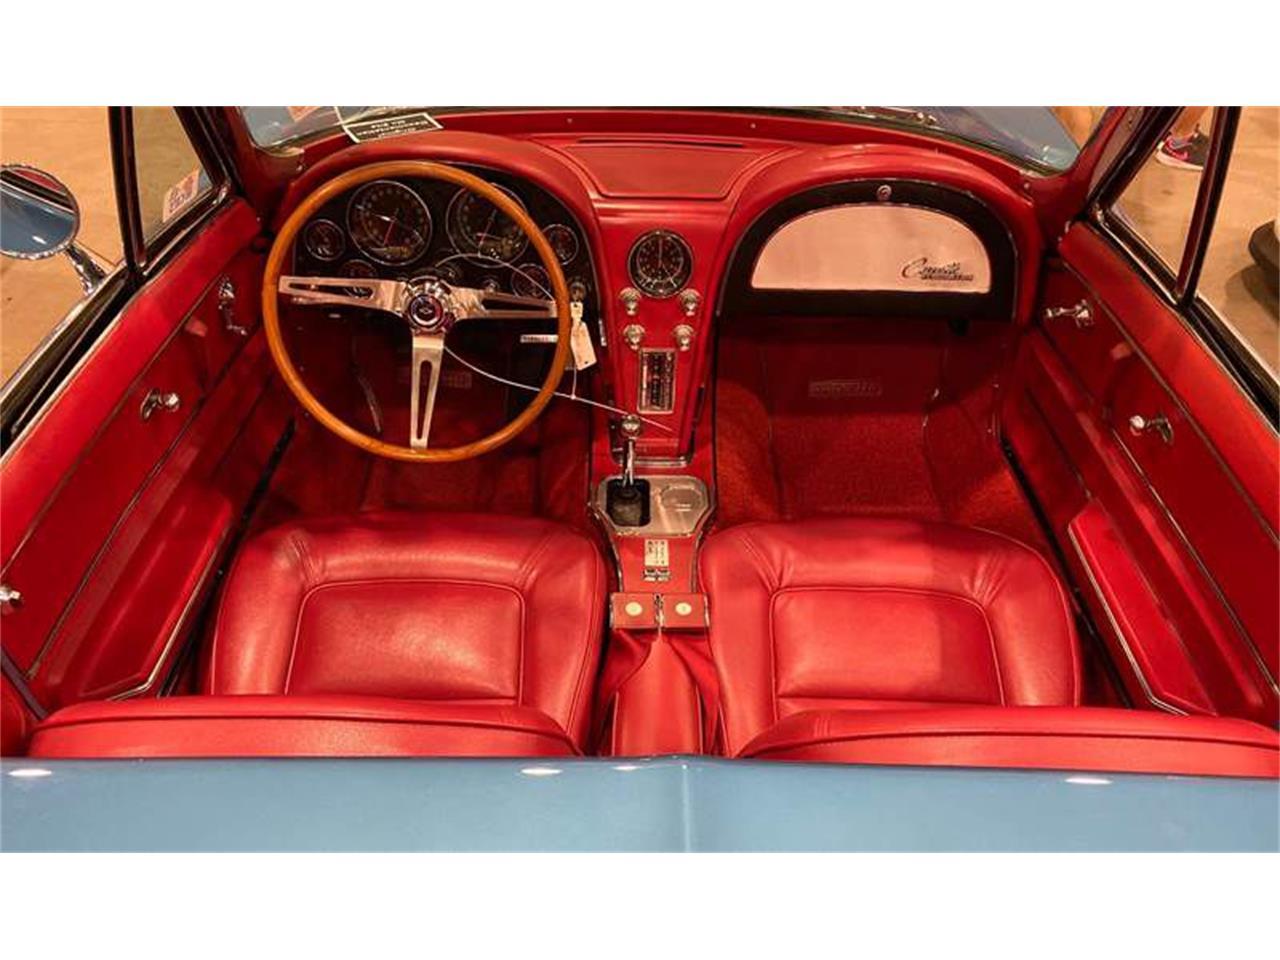 1965 Chevrolet Corvette (CC-1388566) for sale in West Pittston, Pennsylvania